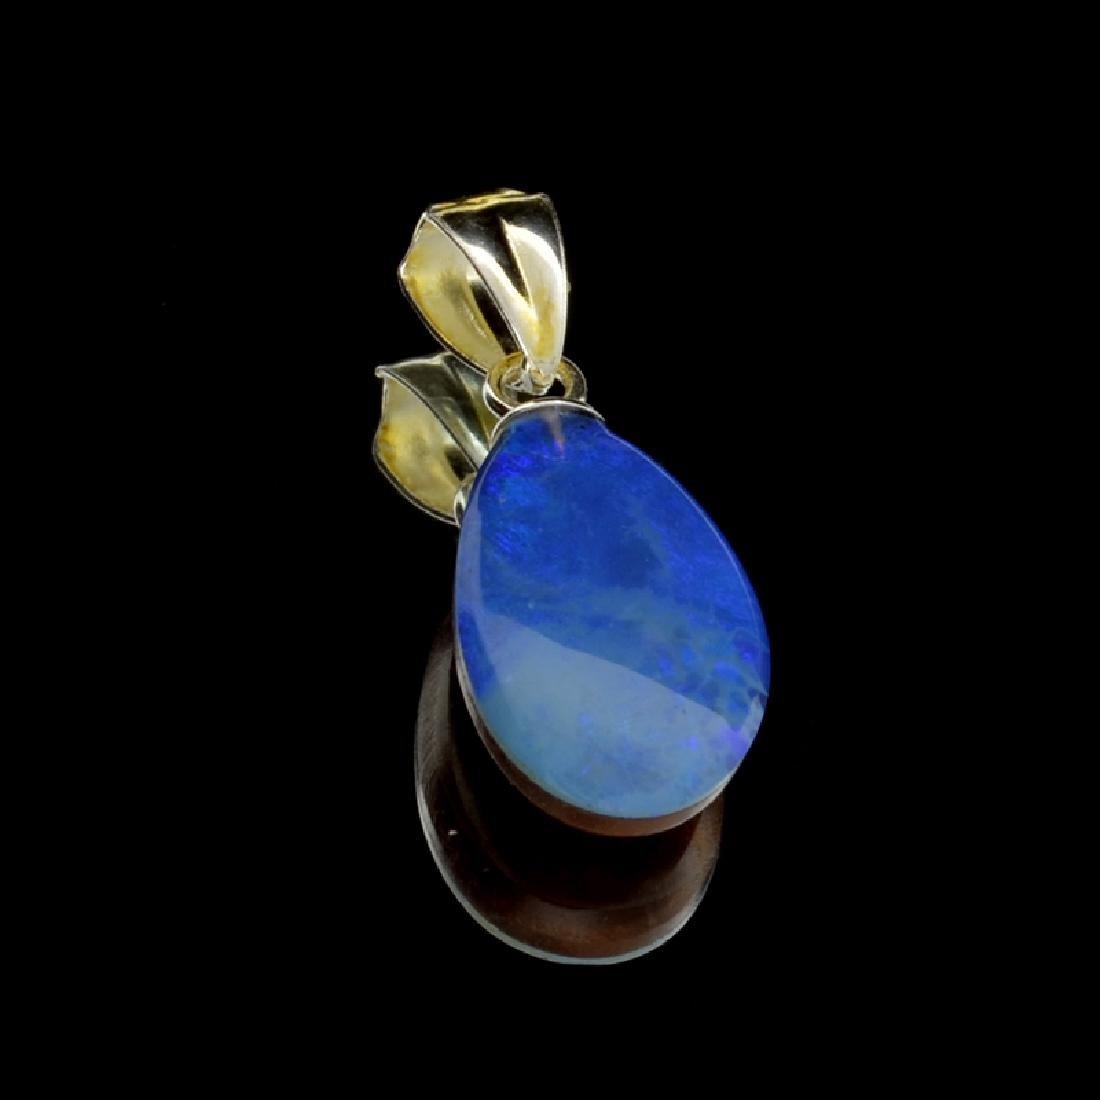 3.15CT Boulder Opal Sterling Silver Pendant